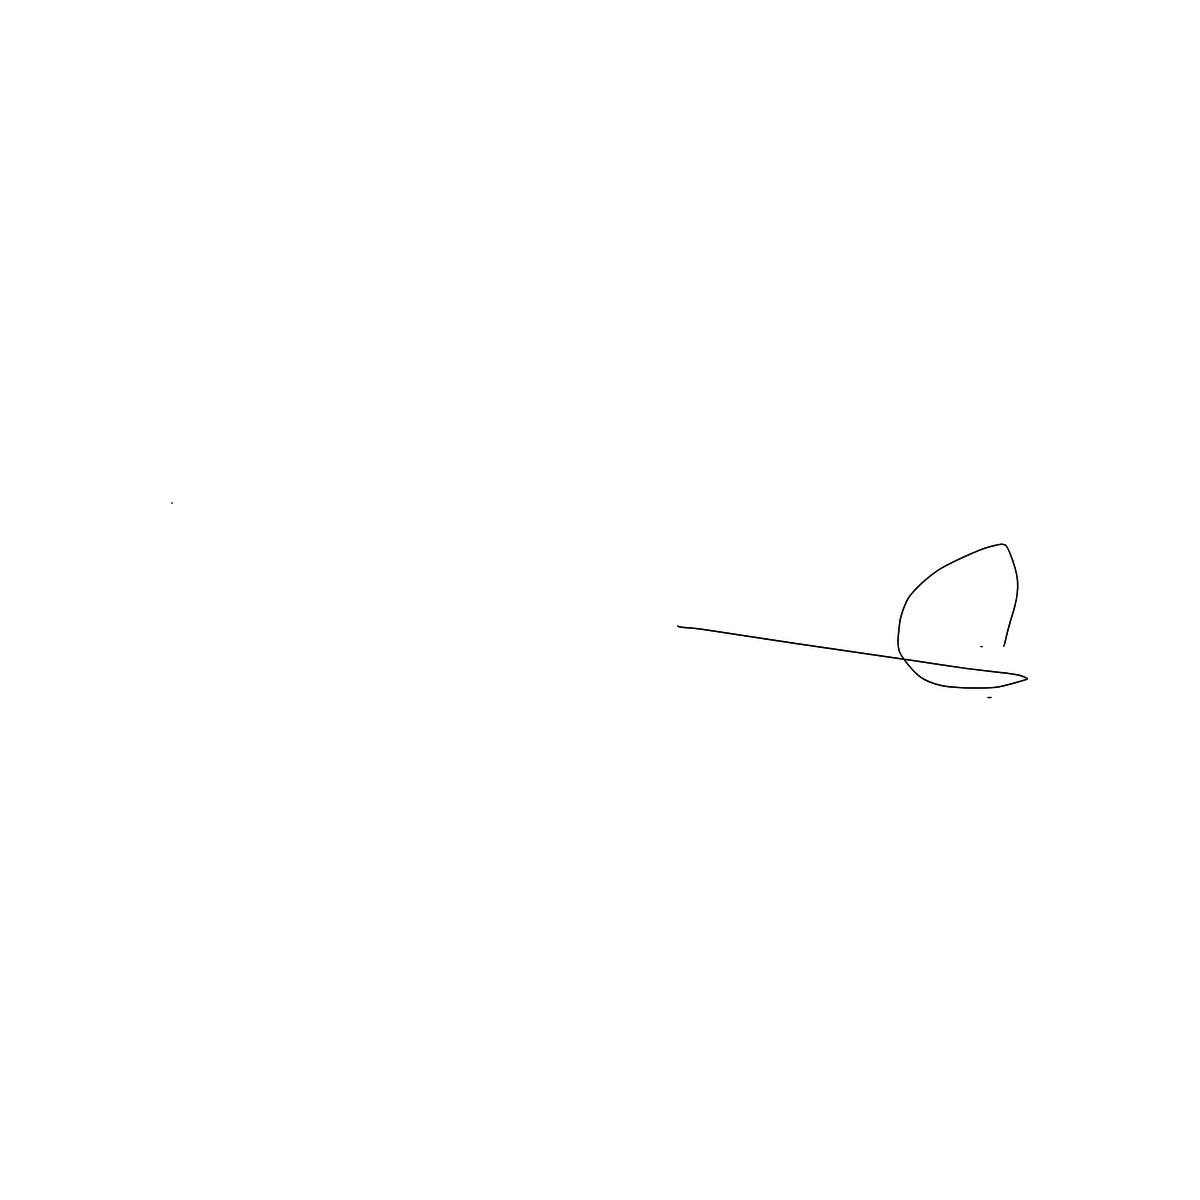 BAAAM drawing#24274 lat:53.3456306457519500lng: 11.8734645843505860